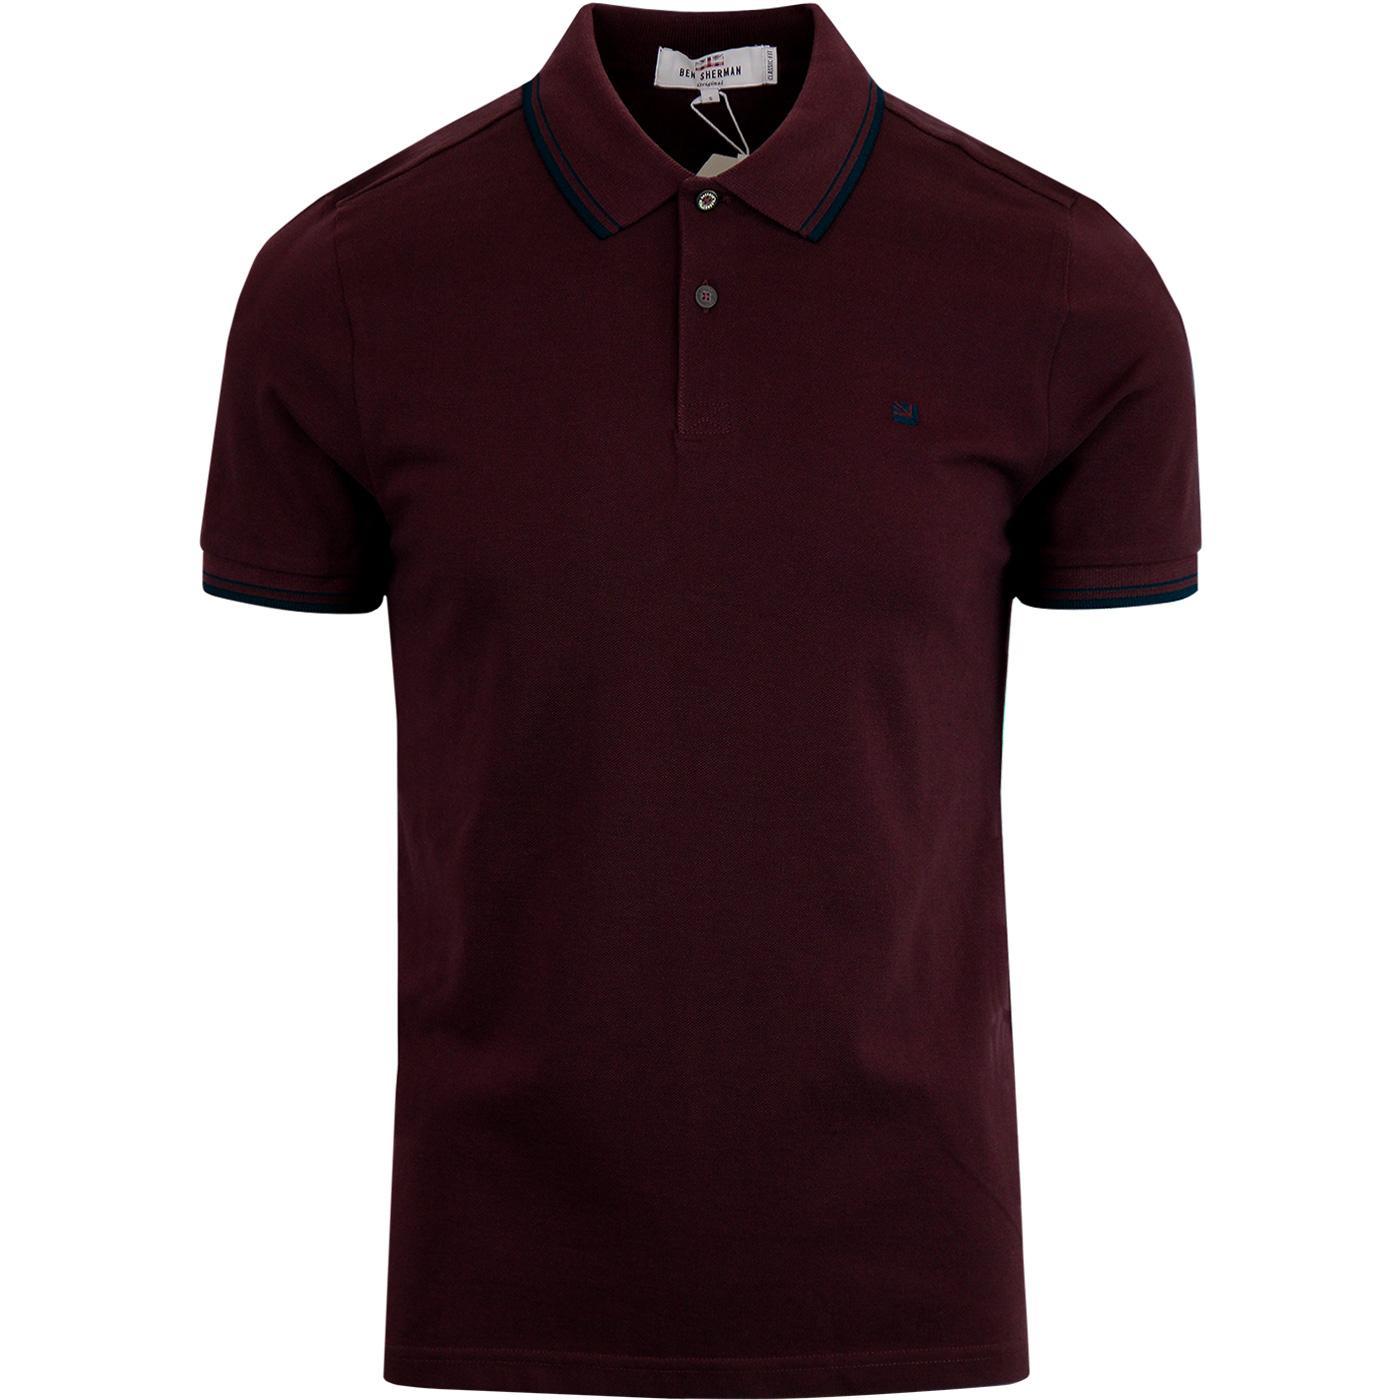 BEN SHERMAN Romford Mod Tipped Polo Shirt WINE